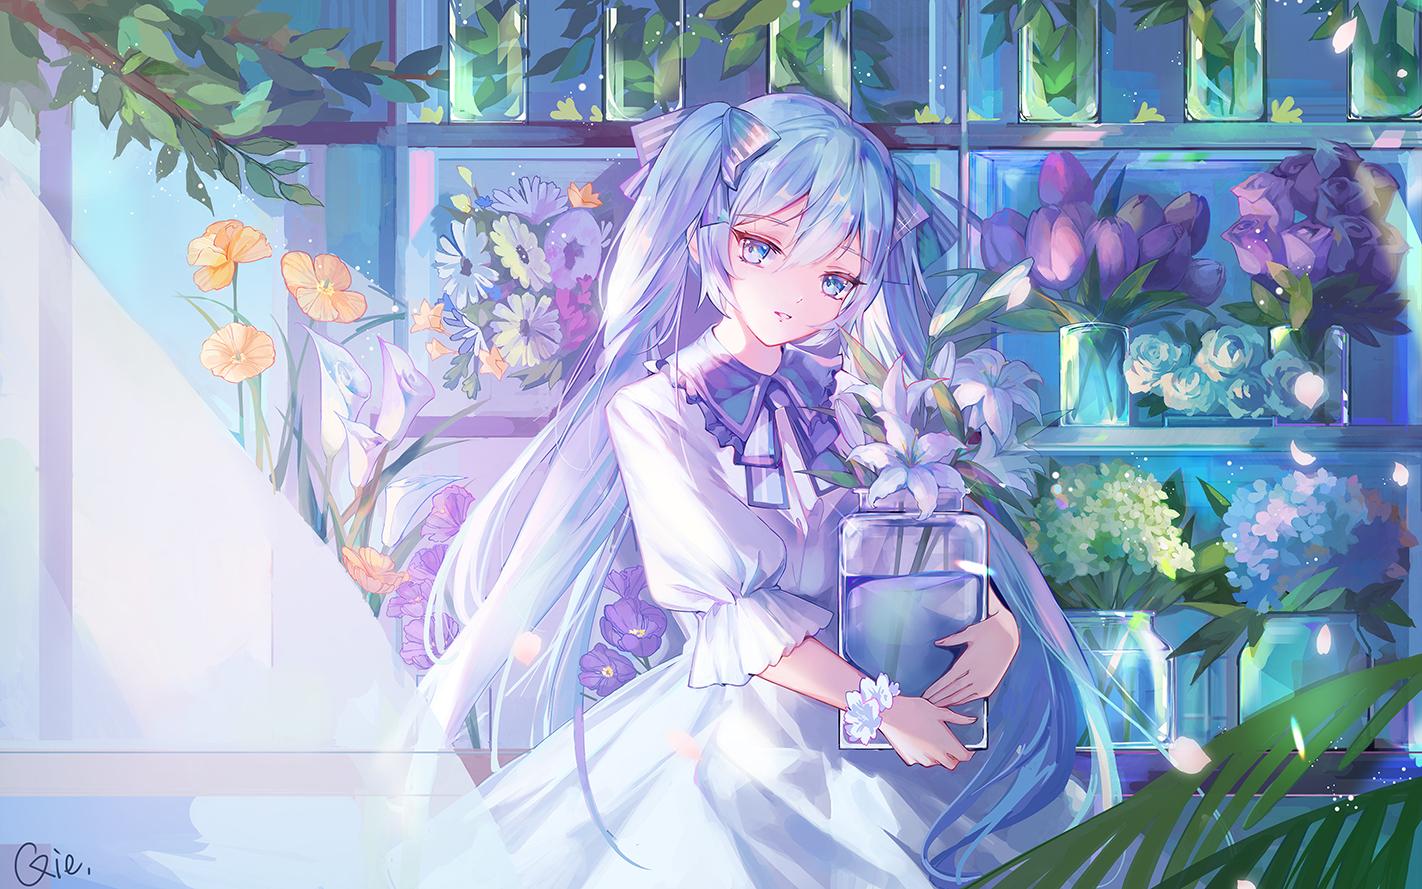 aqua_eyes aqua_hair dress flowers hatsune_miku leaves long_hair petals qie_(25832912) signed twintails vocaloid wristwear